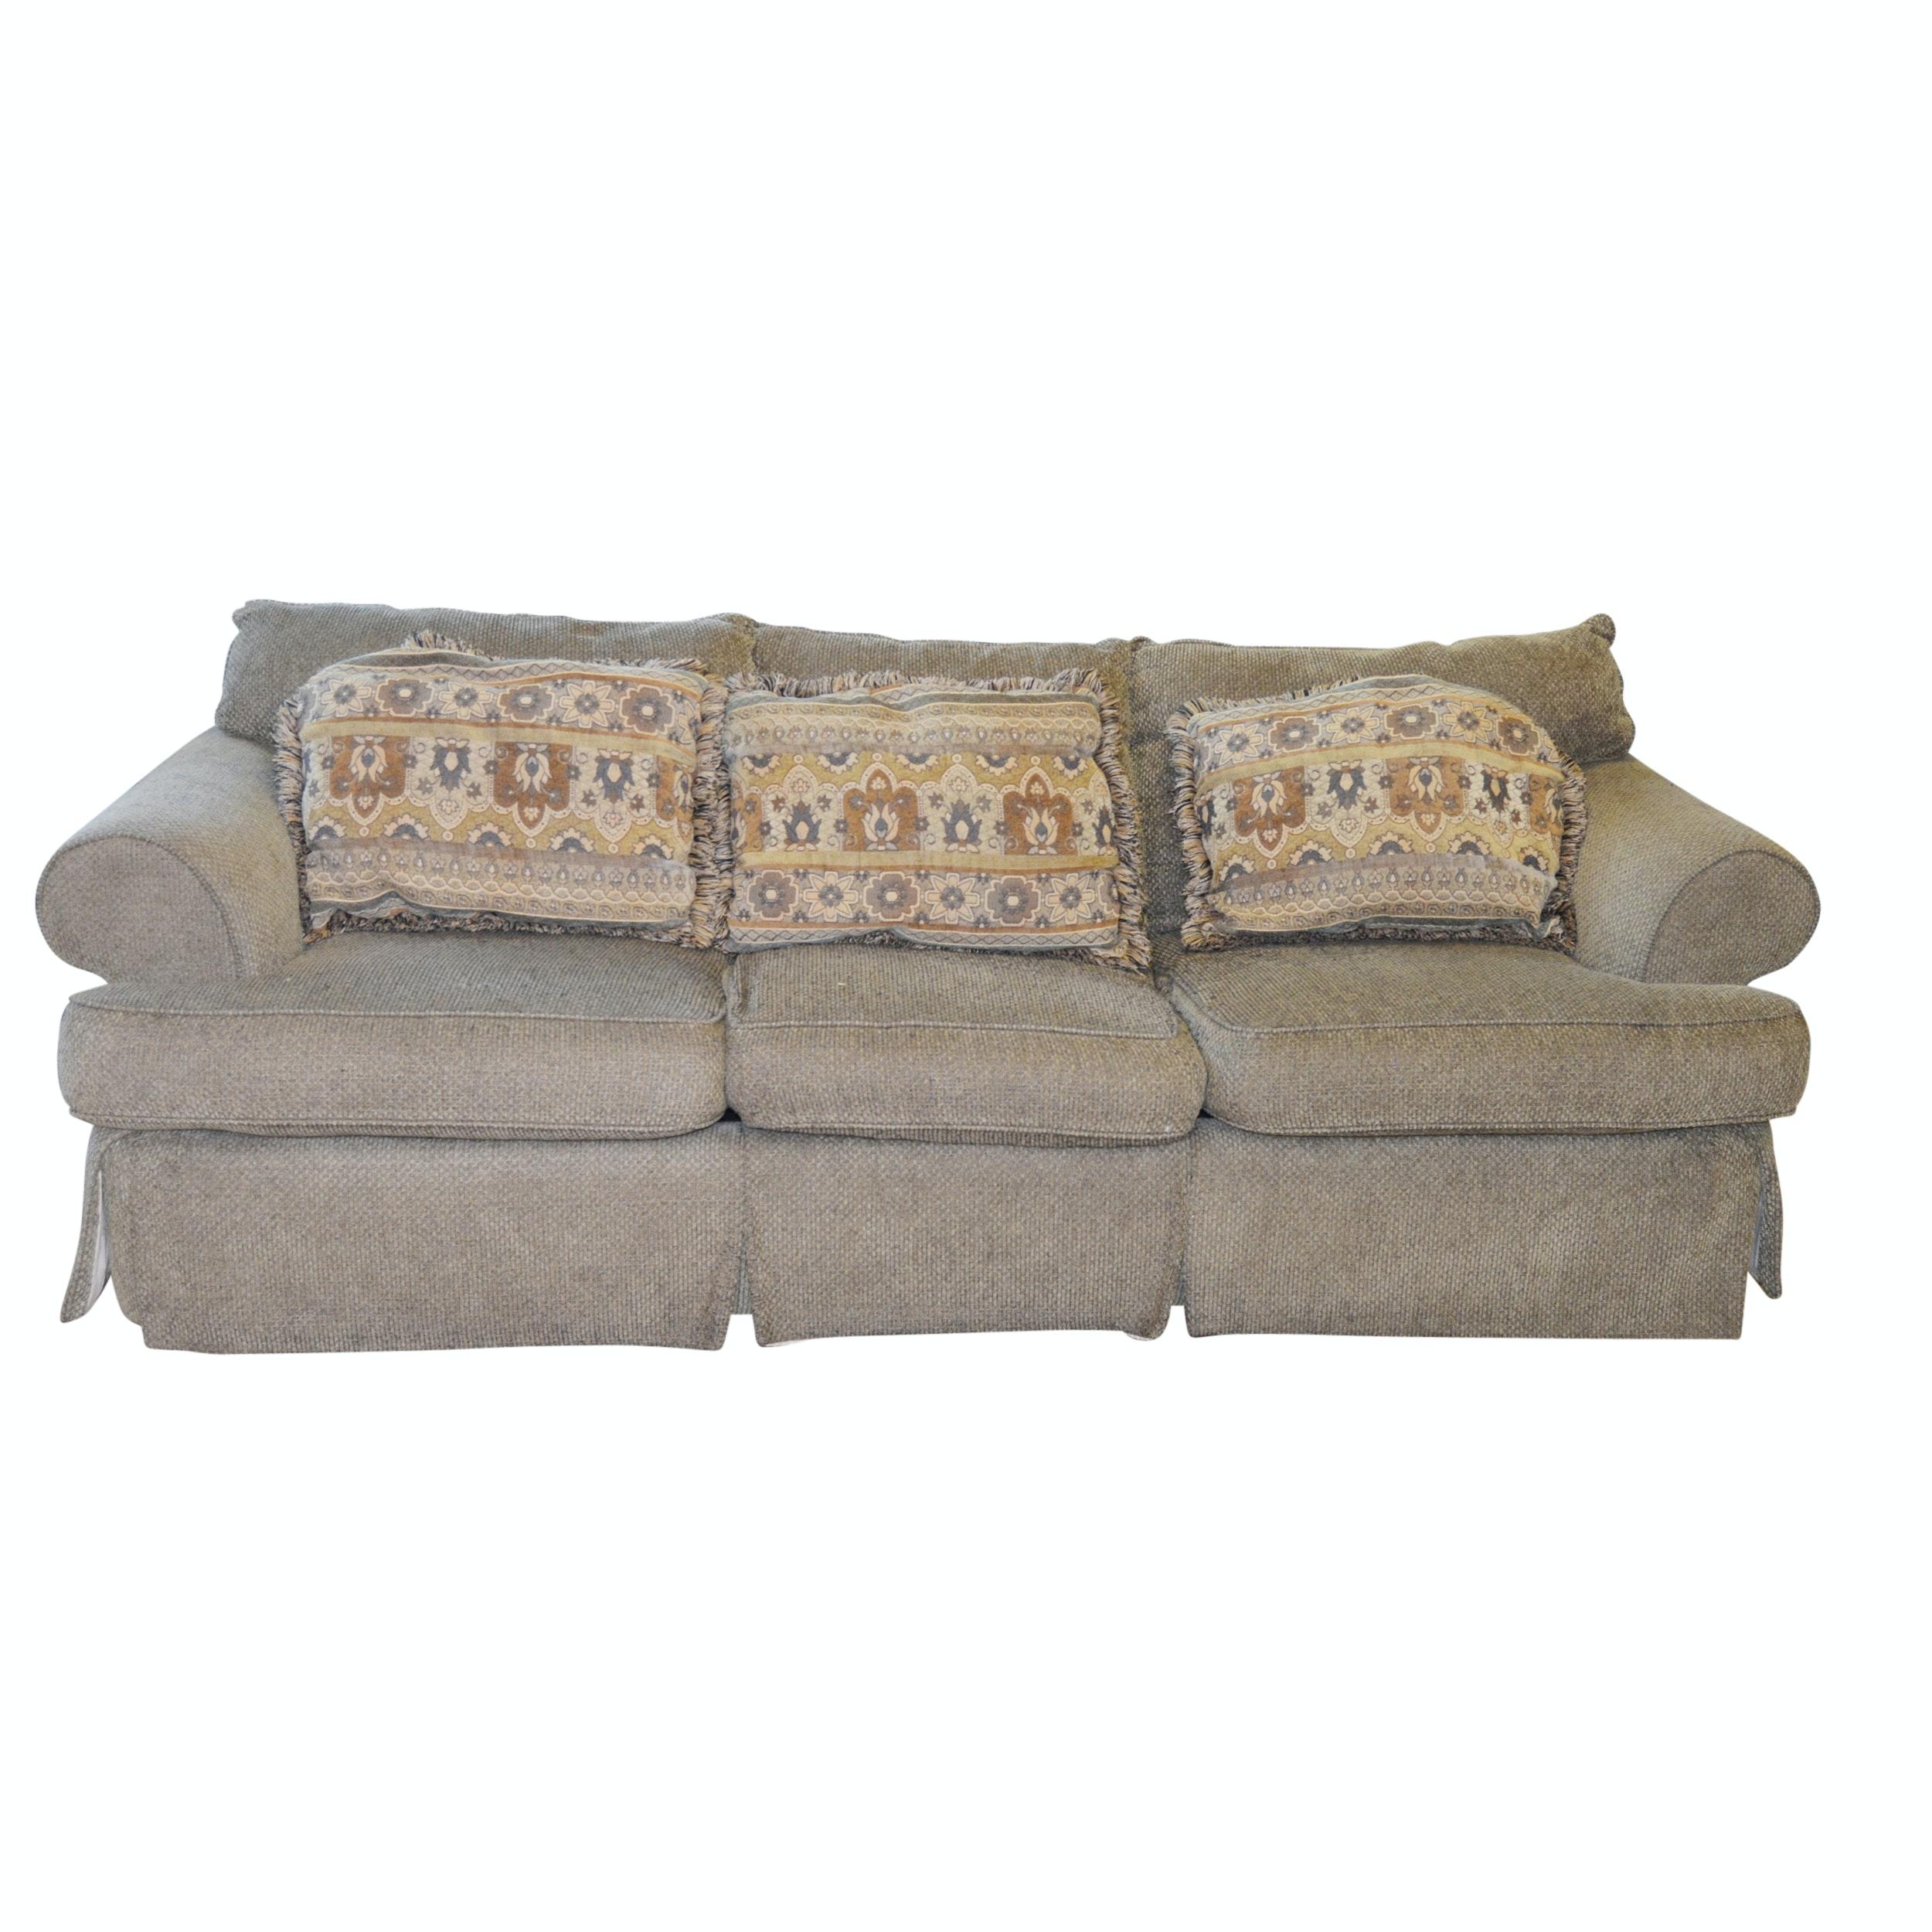 Sofa Express Upholstered Sleeper Sofa